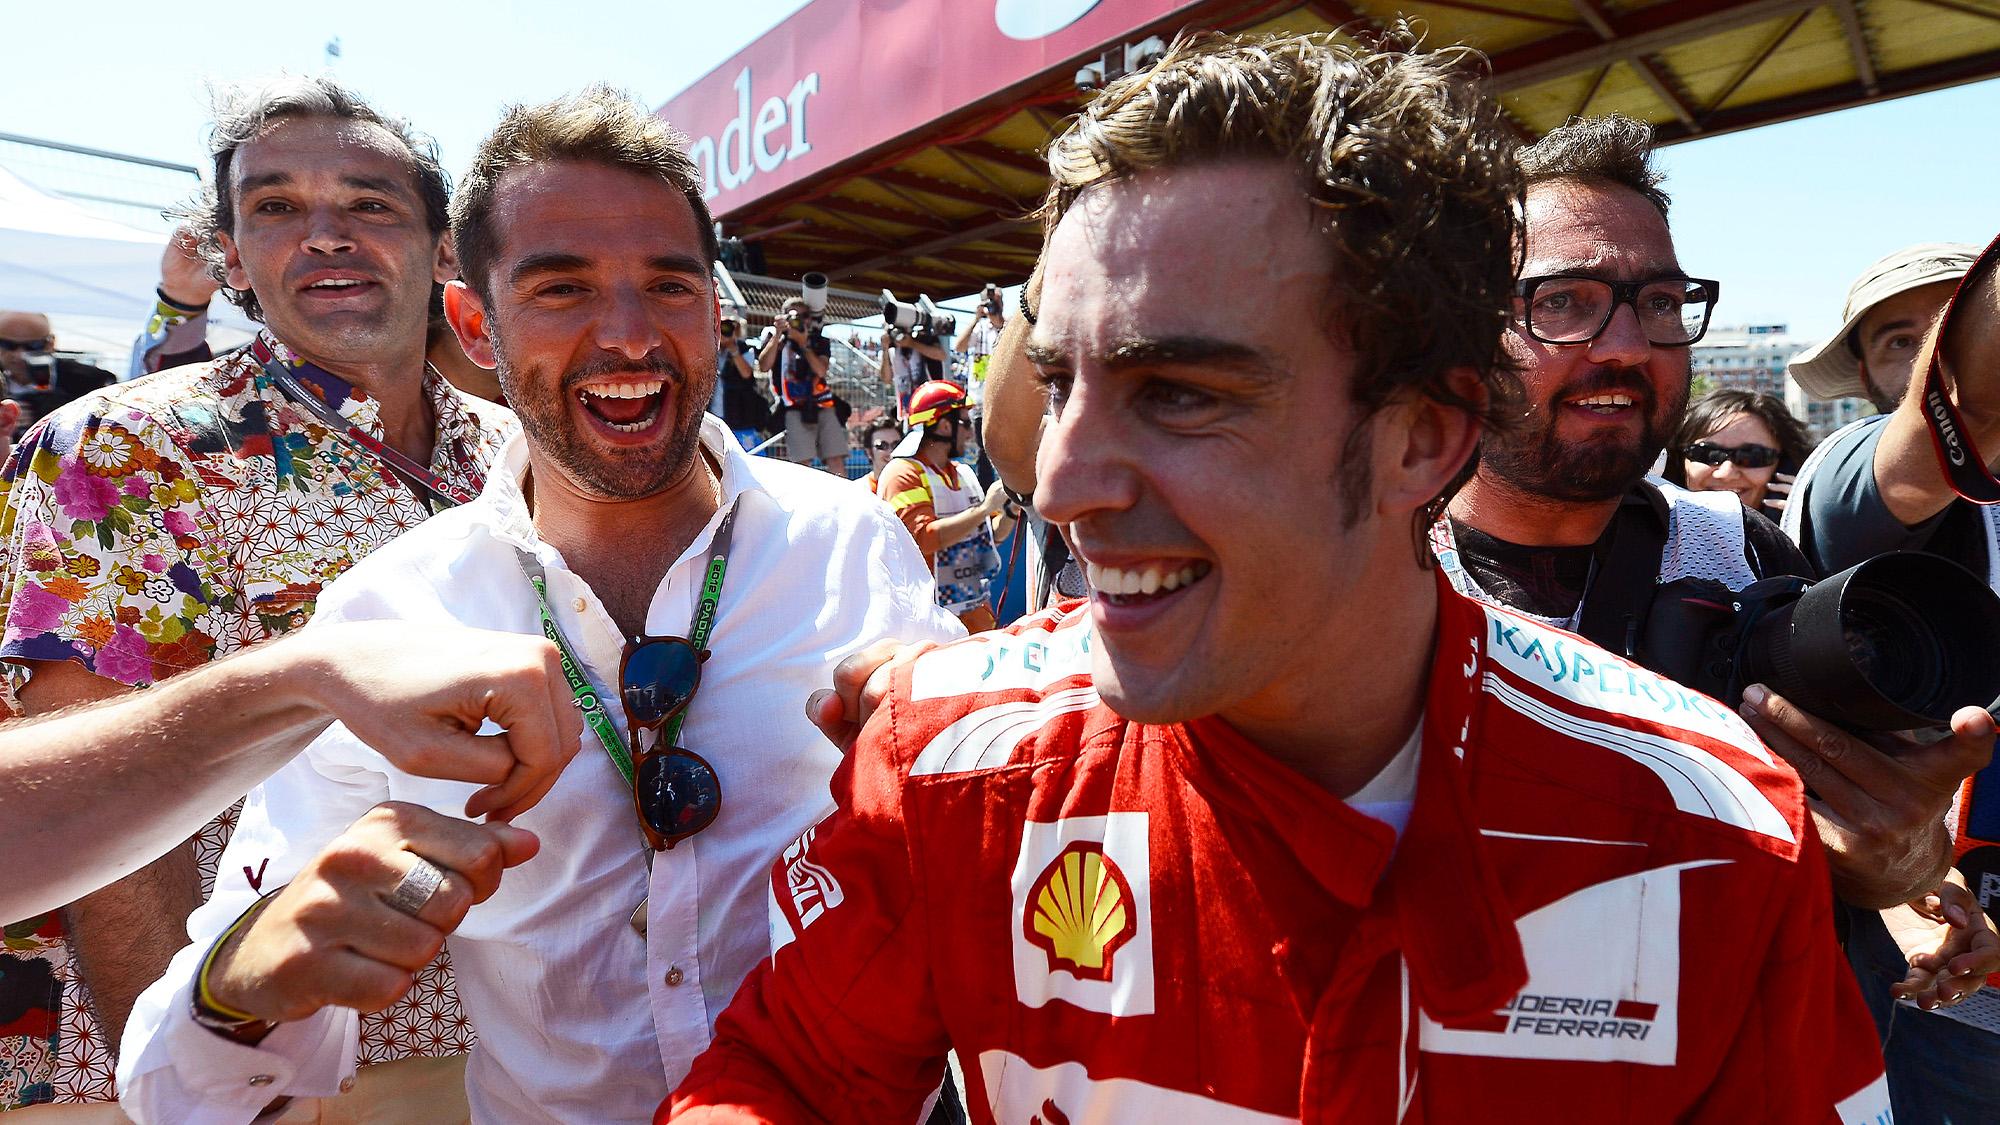 Fernando Alonso celebrates winning the 2012 European GP in Valencia